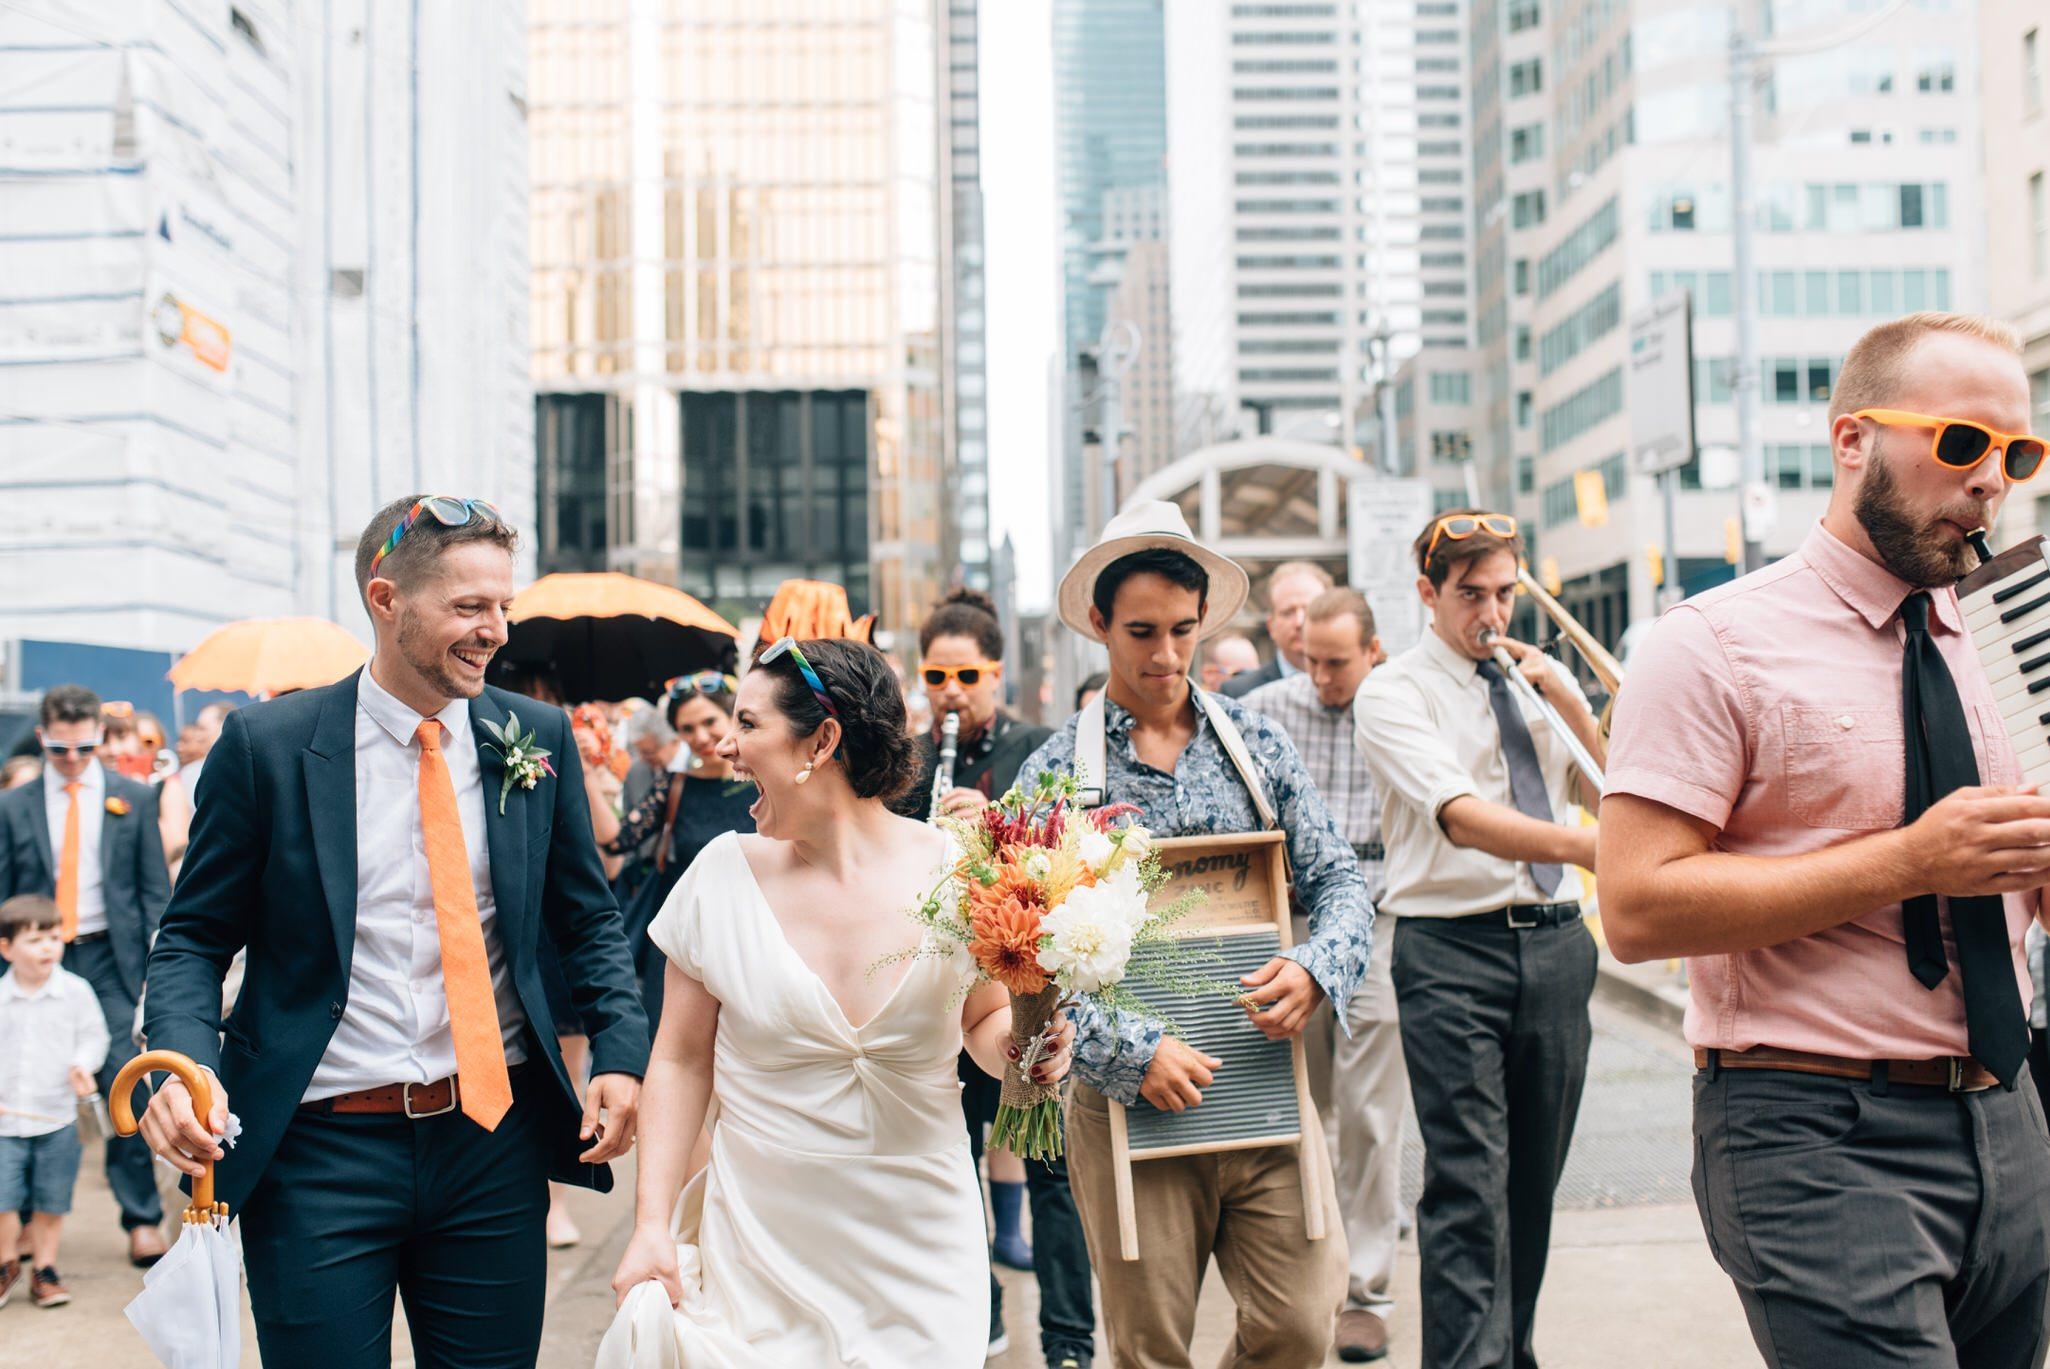 jenny-will-wedding-sara-wilde-photography-0288